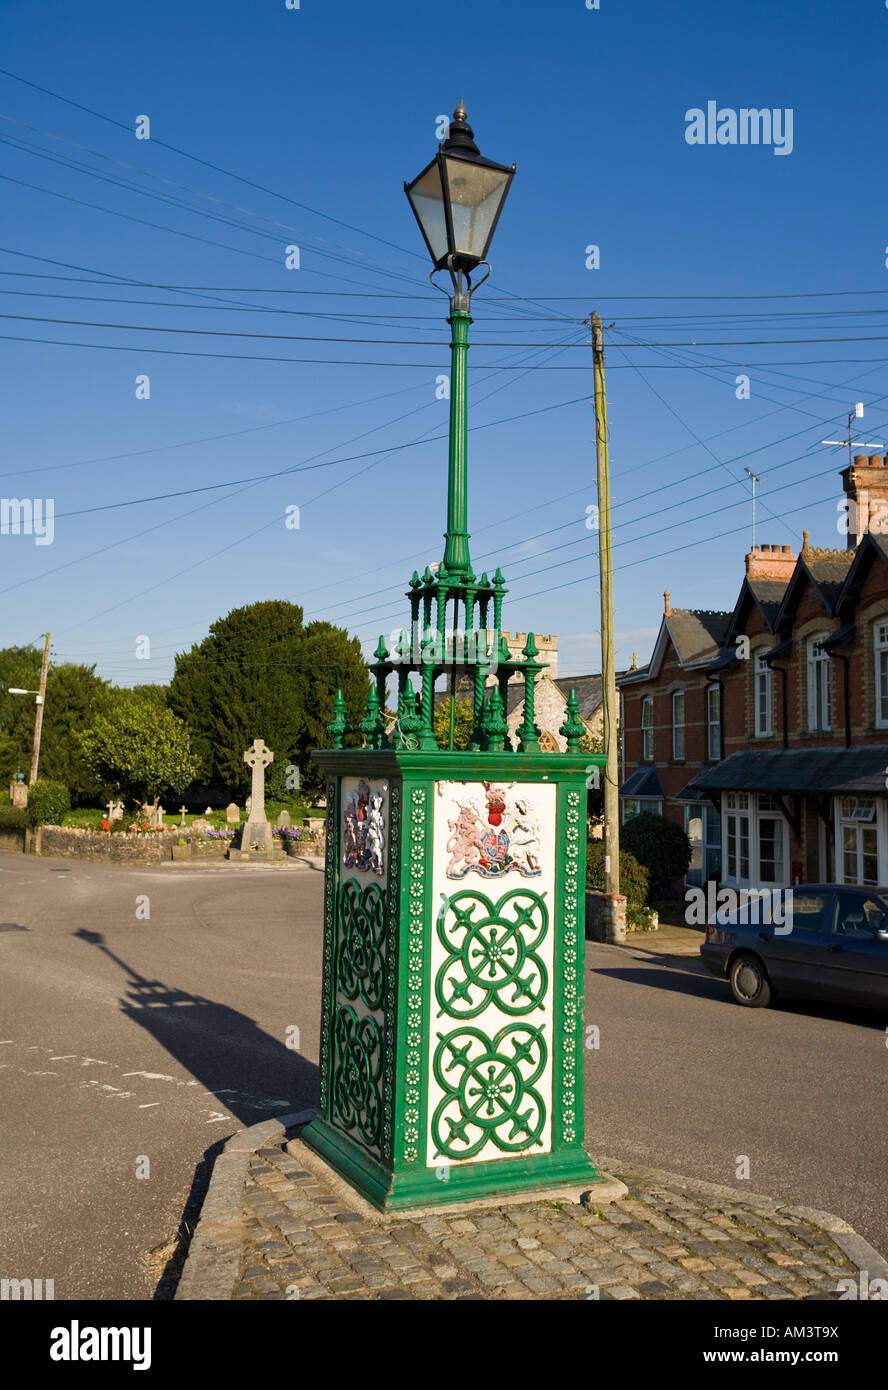 Old village water pump in the village of Hemyock, Devon, UK - Stock Image